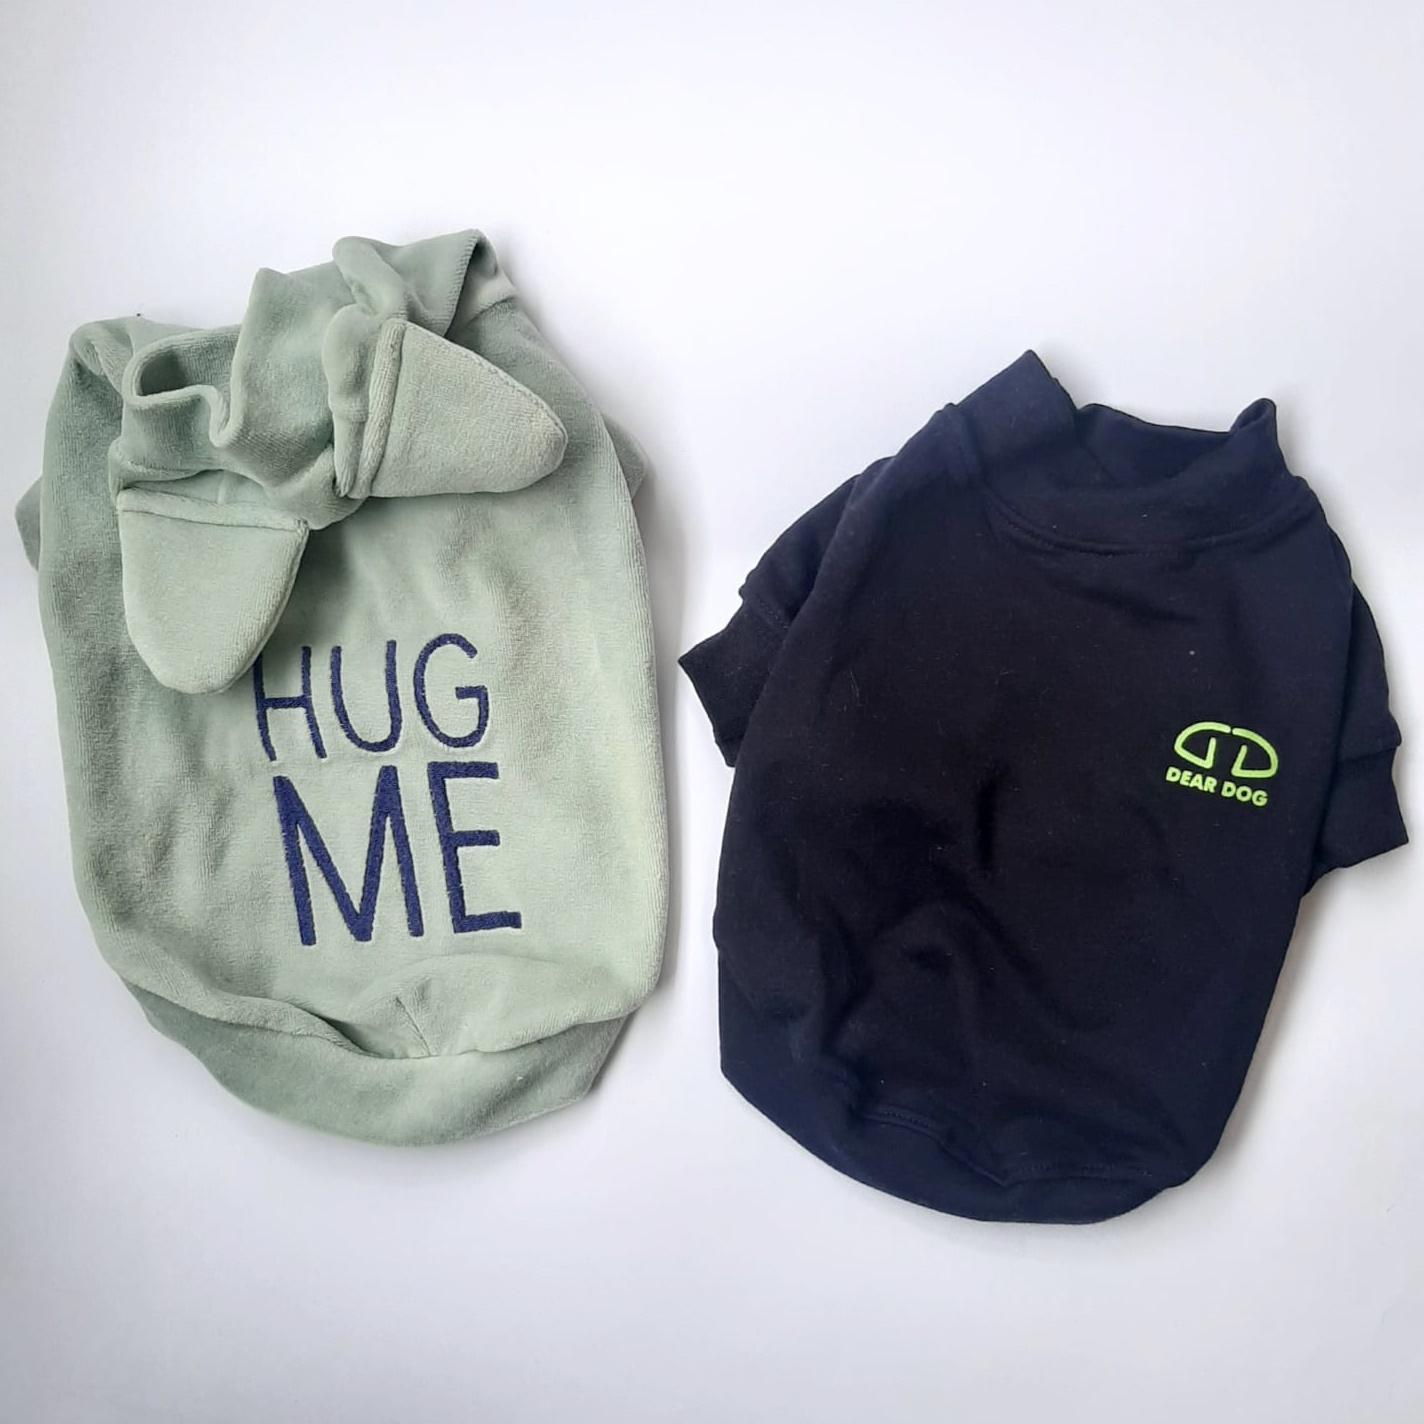 Plush + Moletom Hug Me